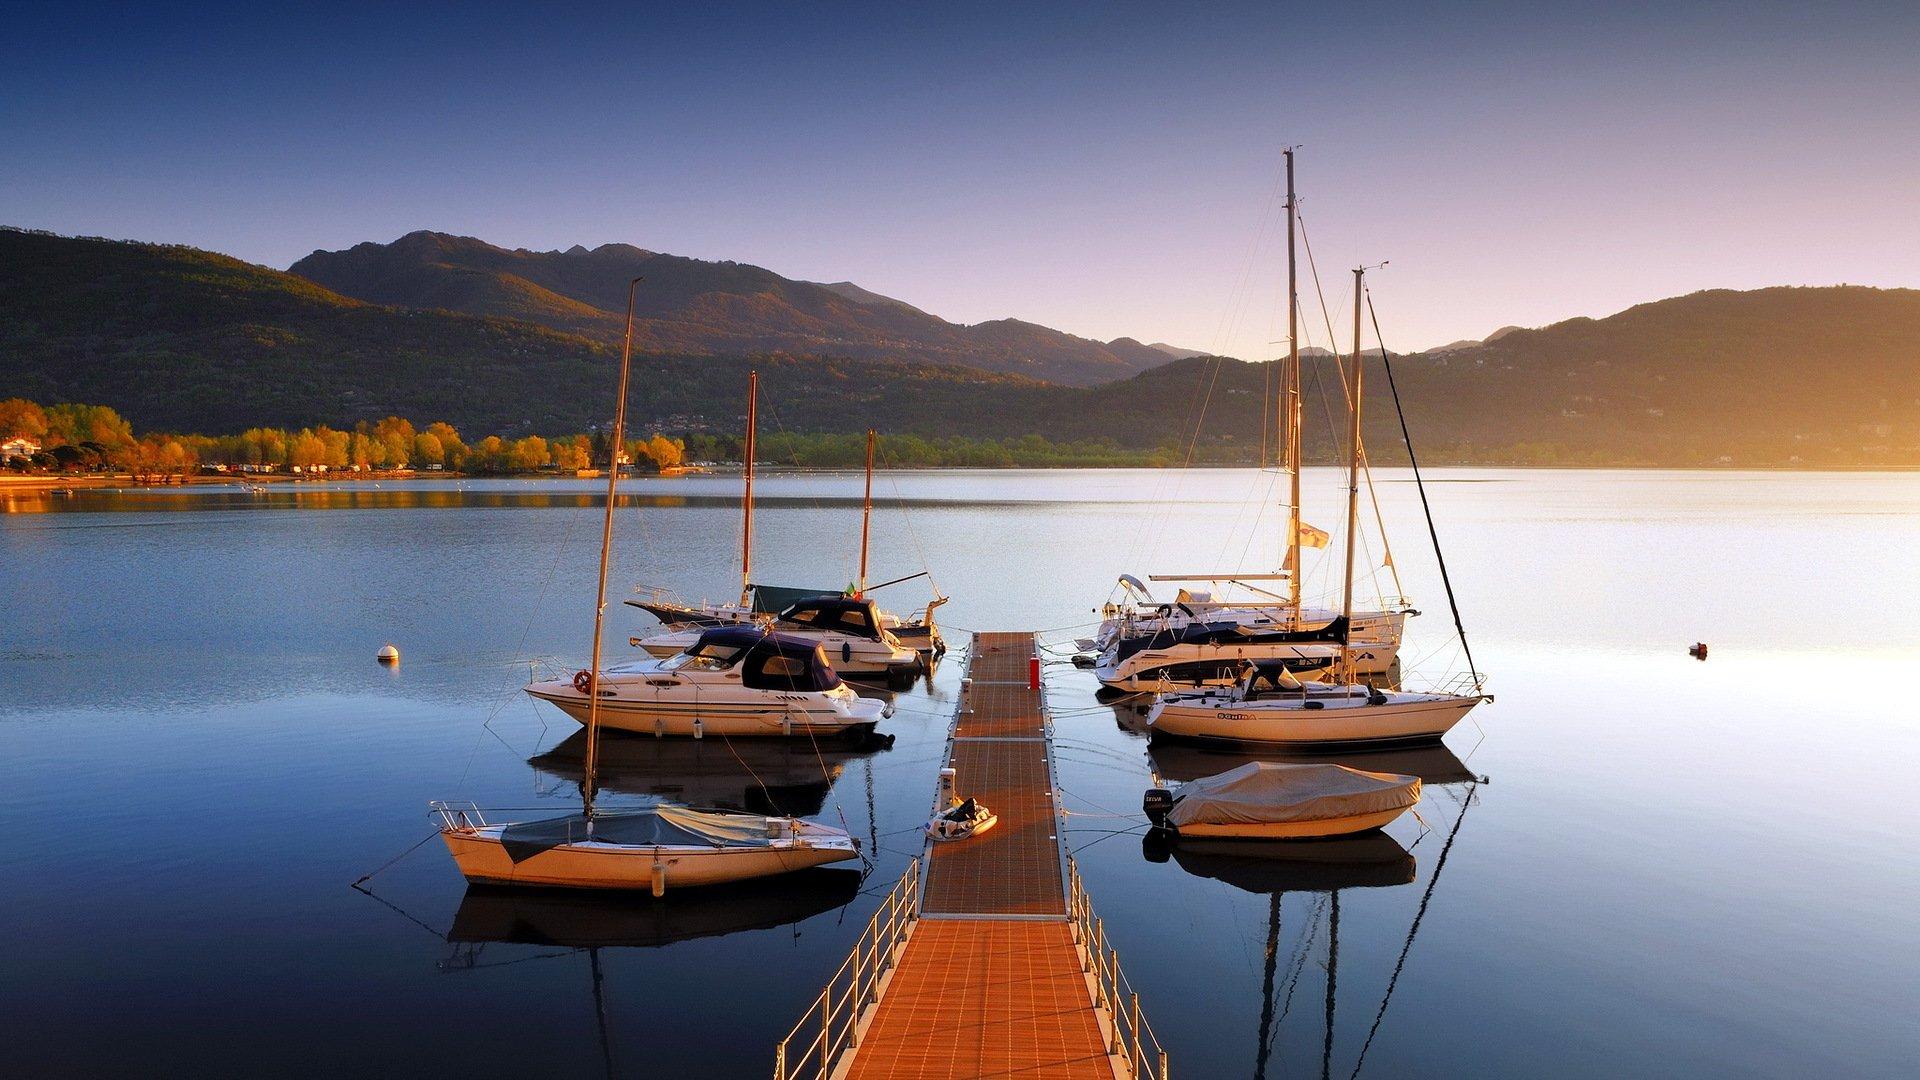 Солнце в горах озеро яхты картинки